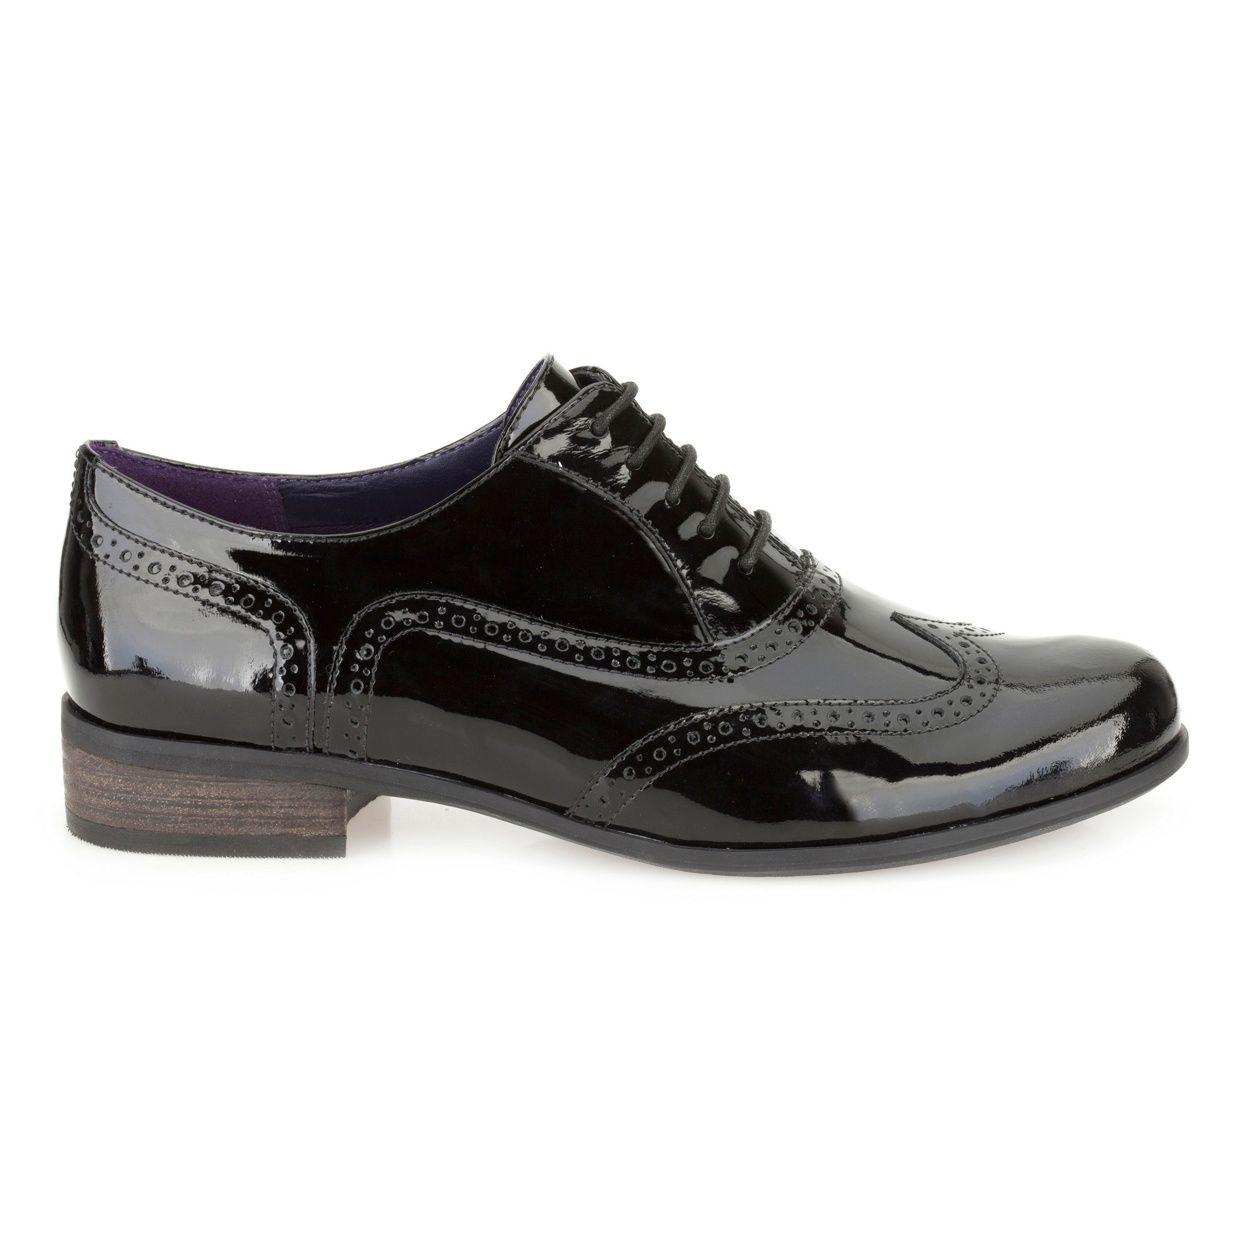 Clarks Black 'Hamble Oak' leather